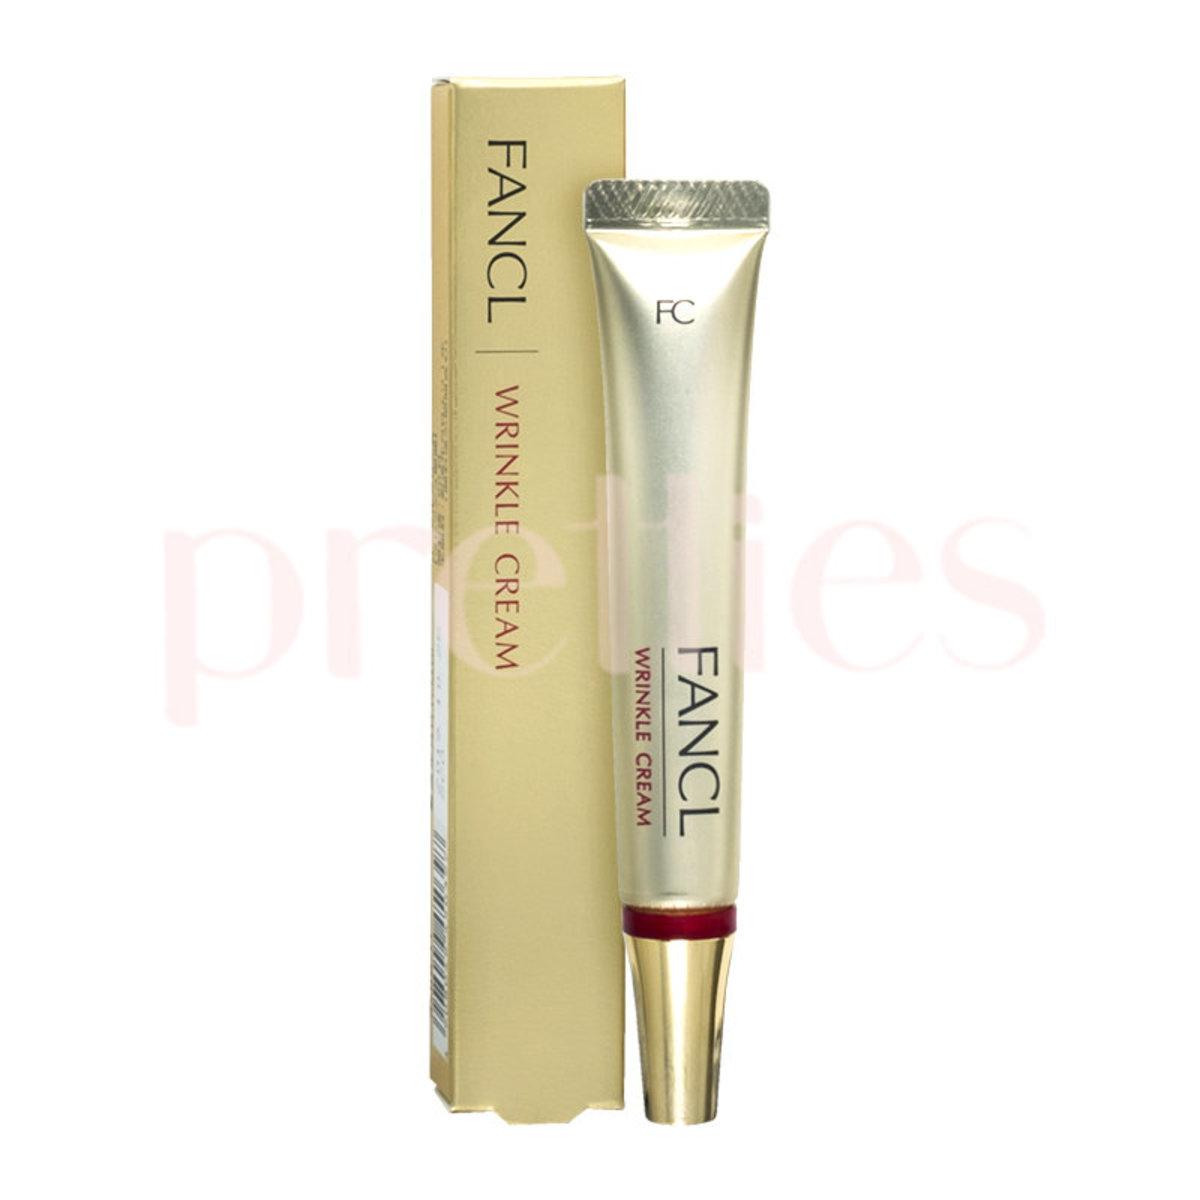 Wrinkle Cream 12g (Parallel Import)